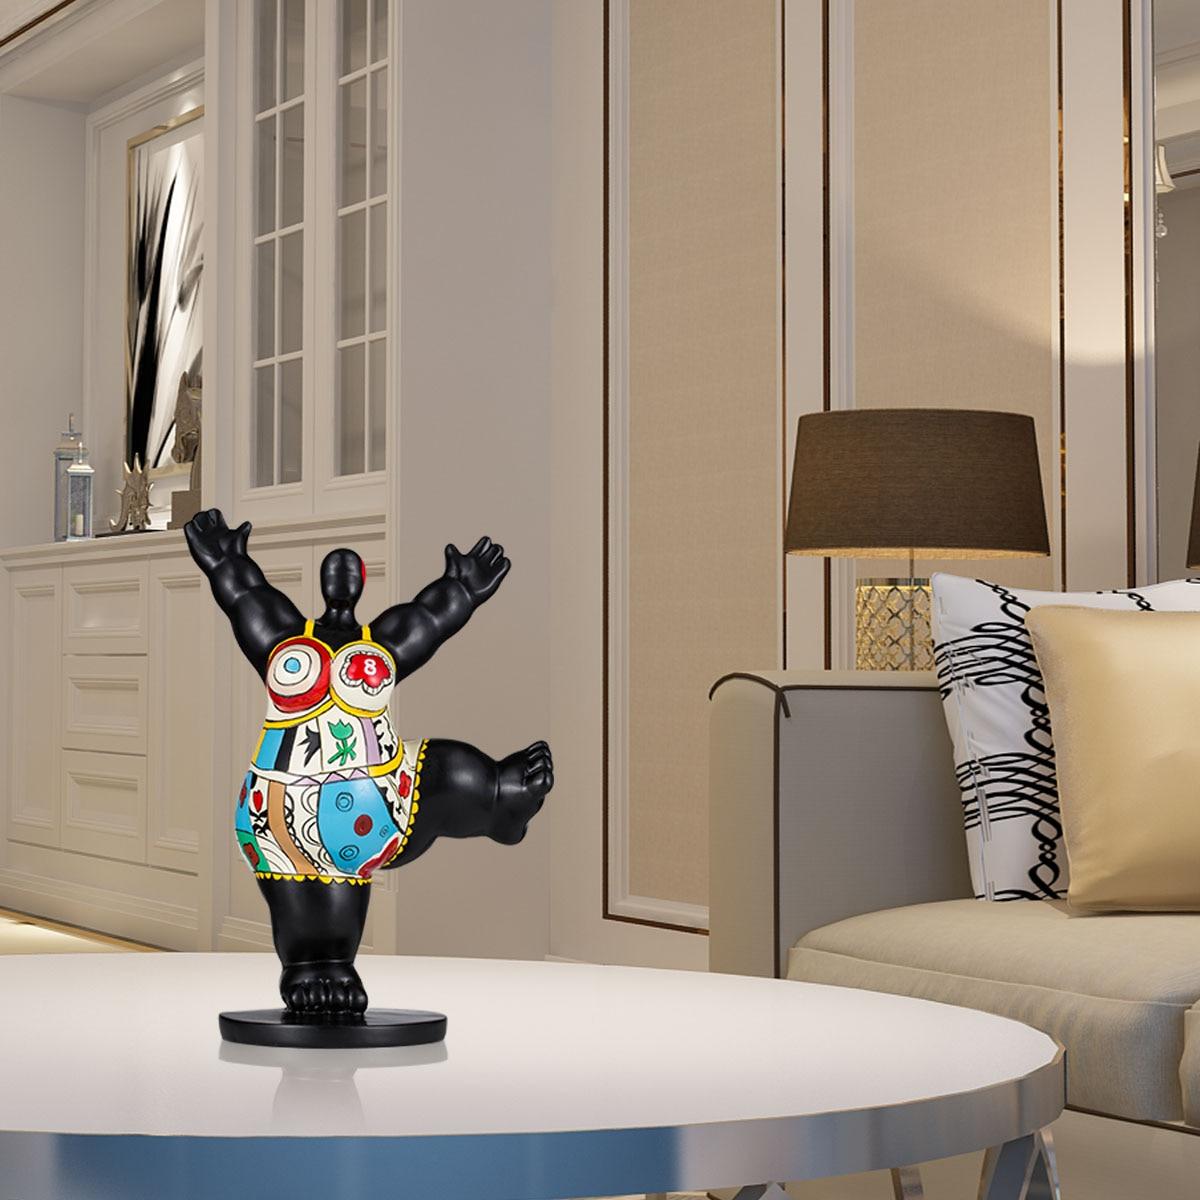 Escultura elegante de fibra de vidrio para mujer, escultura exagerada, adorno decorativo para oficina en casa